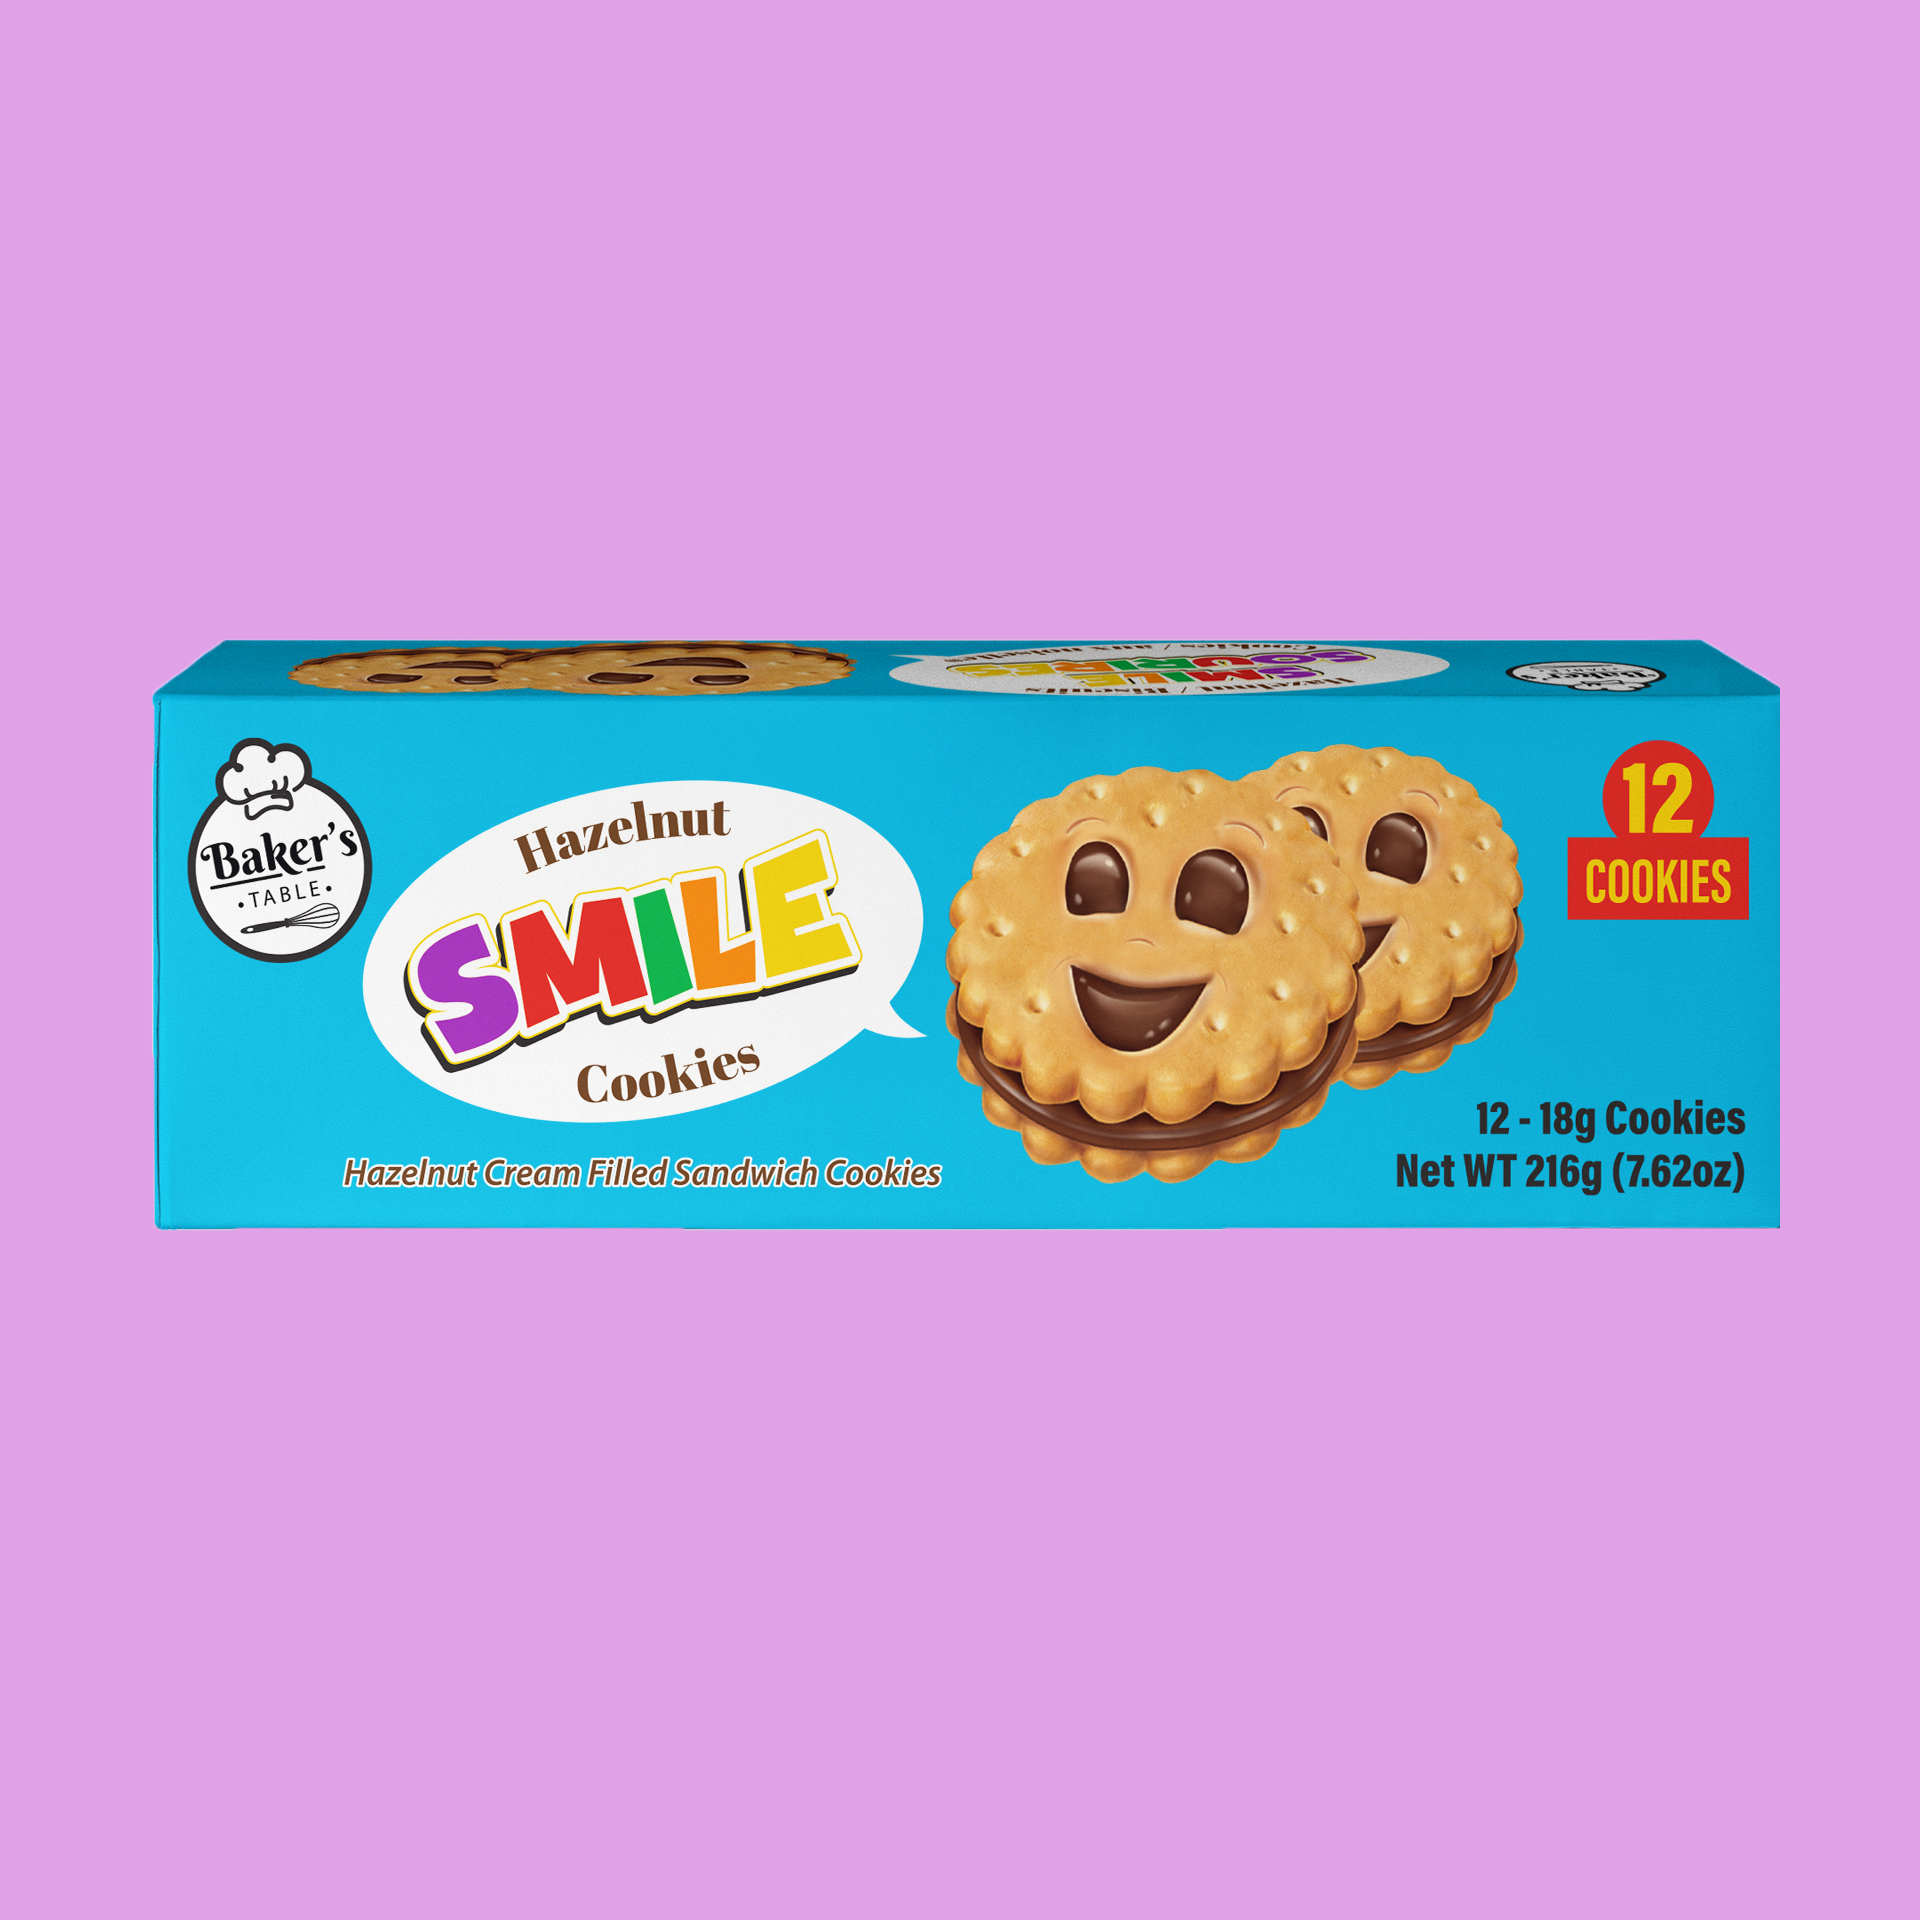 https://secureservercdn.net/198.71.233.33/oj7.4f7.myftpupload.com/wp-content/uploads/2021/04/silo-Bakers_Table_Hazelnut-SMILES_Cookies.png?time=1620925060